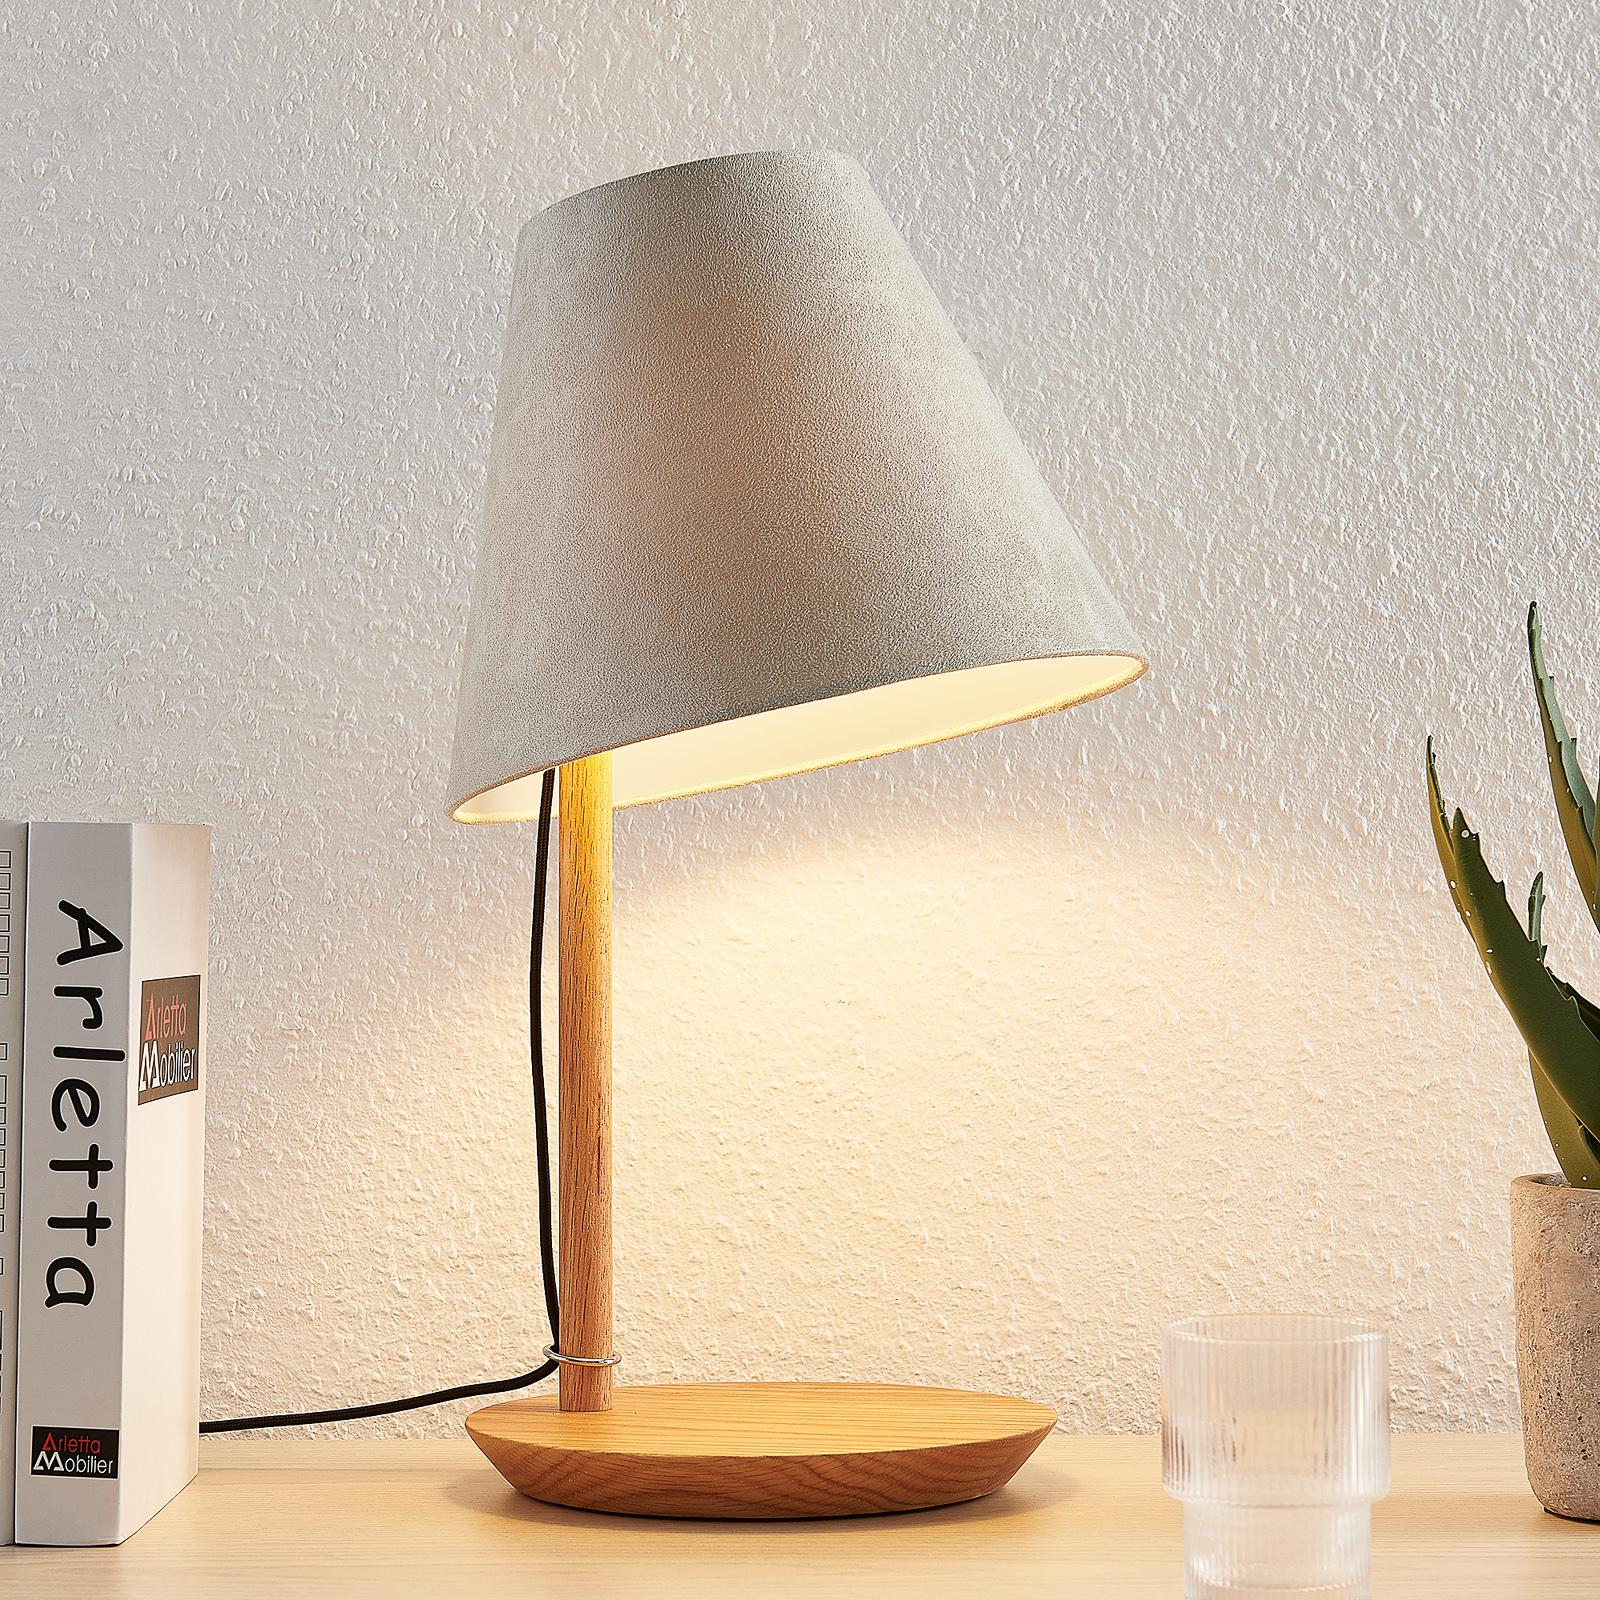 Lucande Jinda tafellamp, houtframe, fluweel grijs